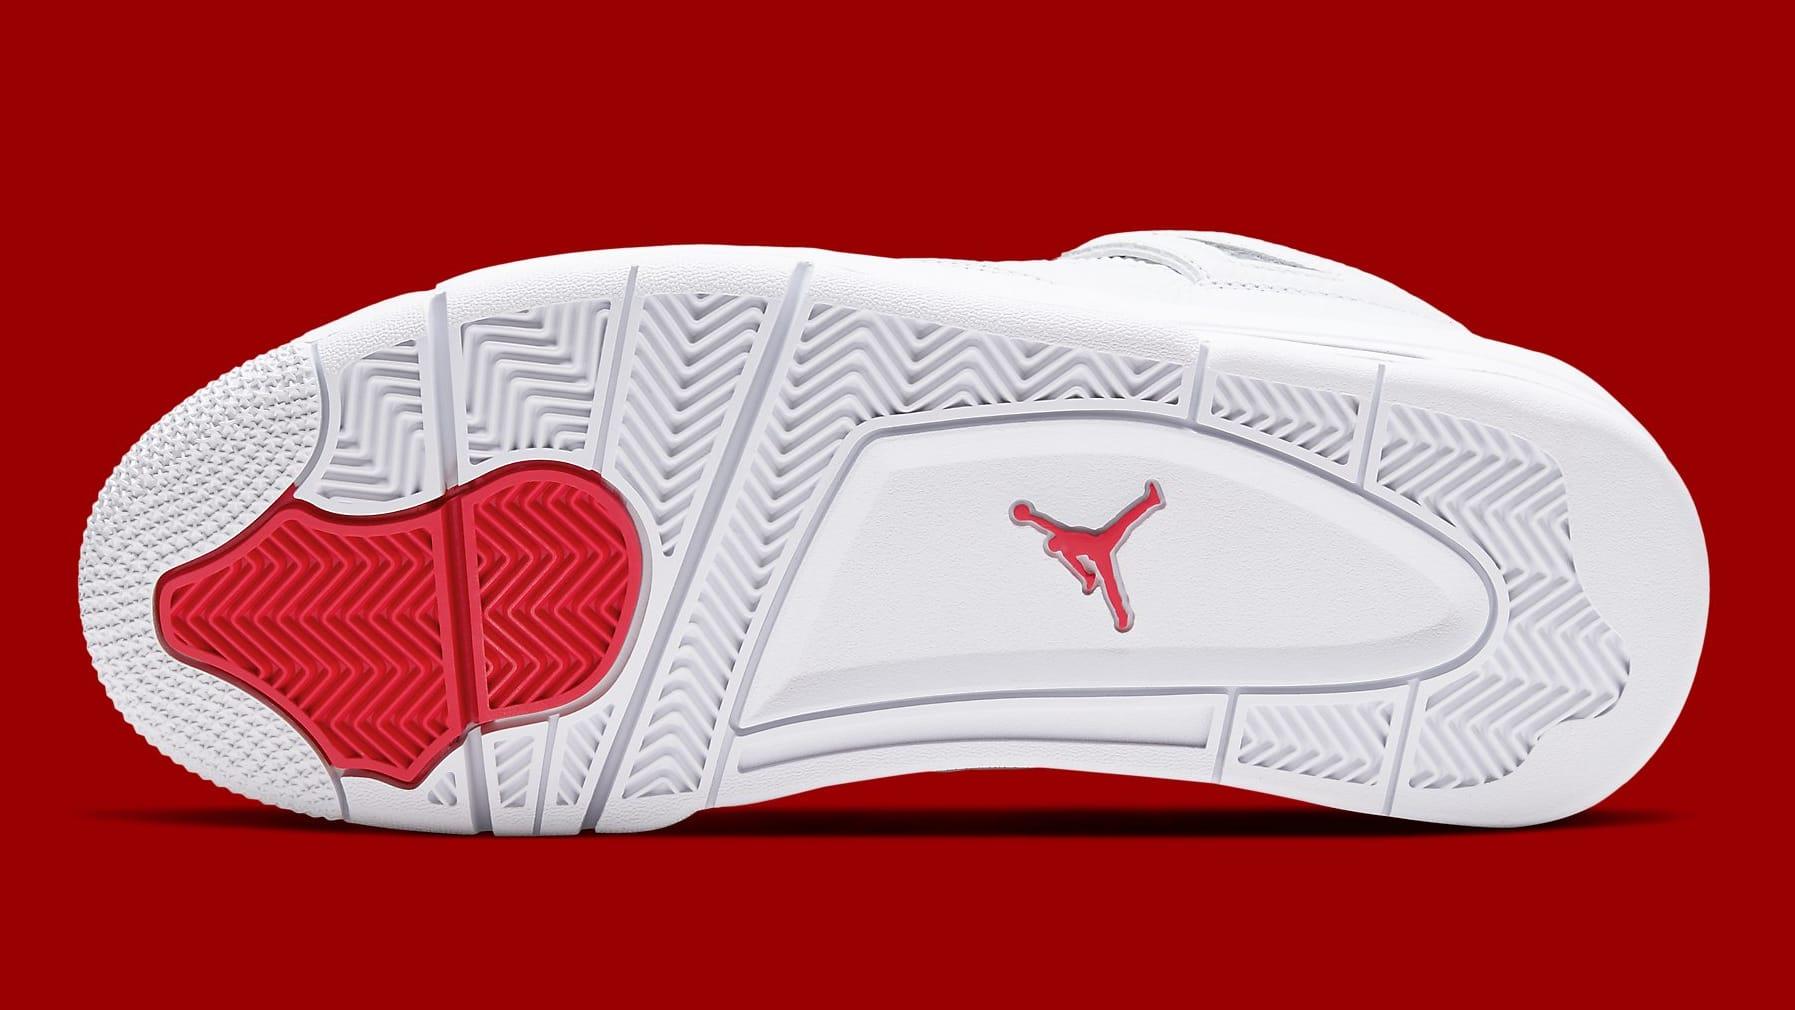 Air Jordan 4 Metallic Red Release Date CT8527-112 Sole